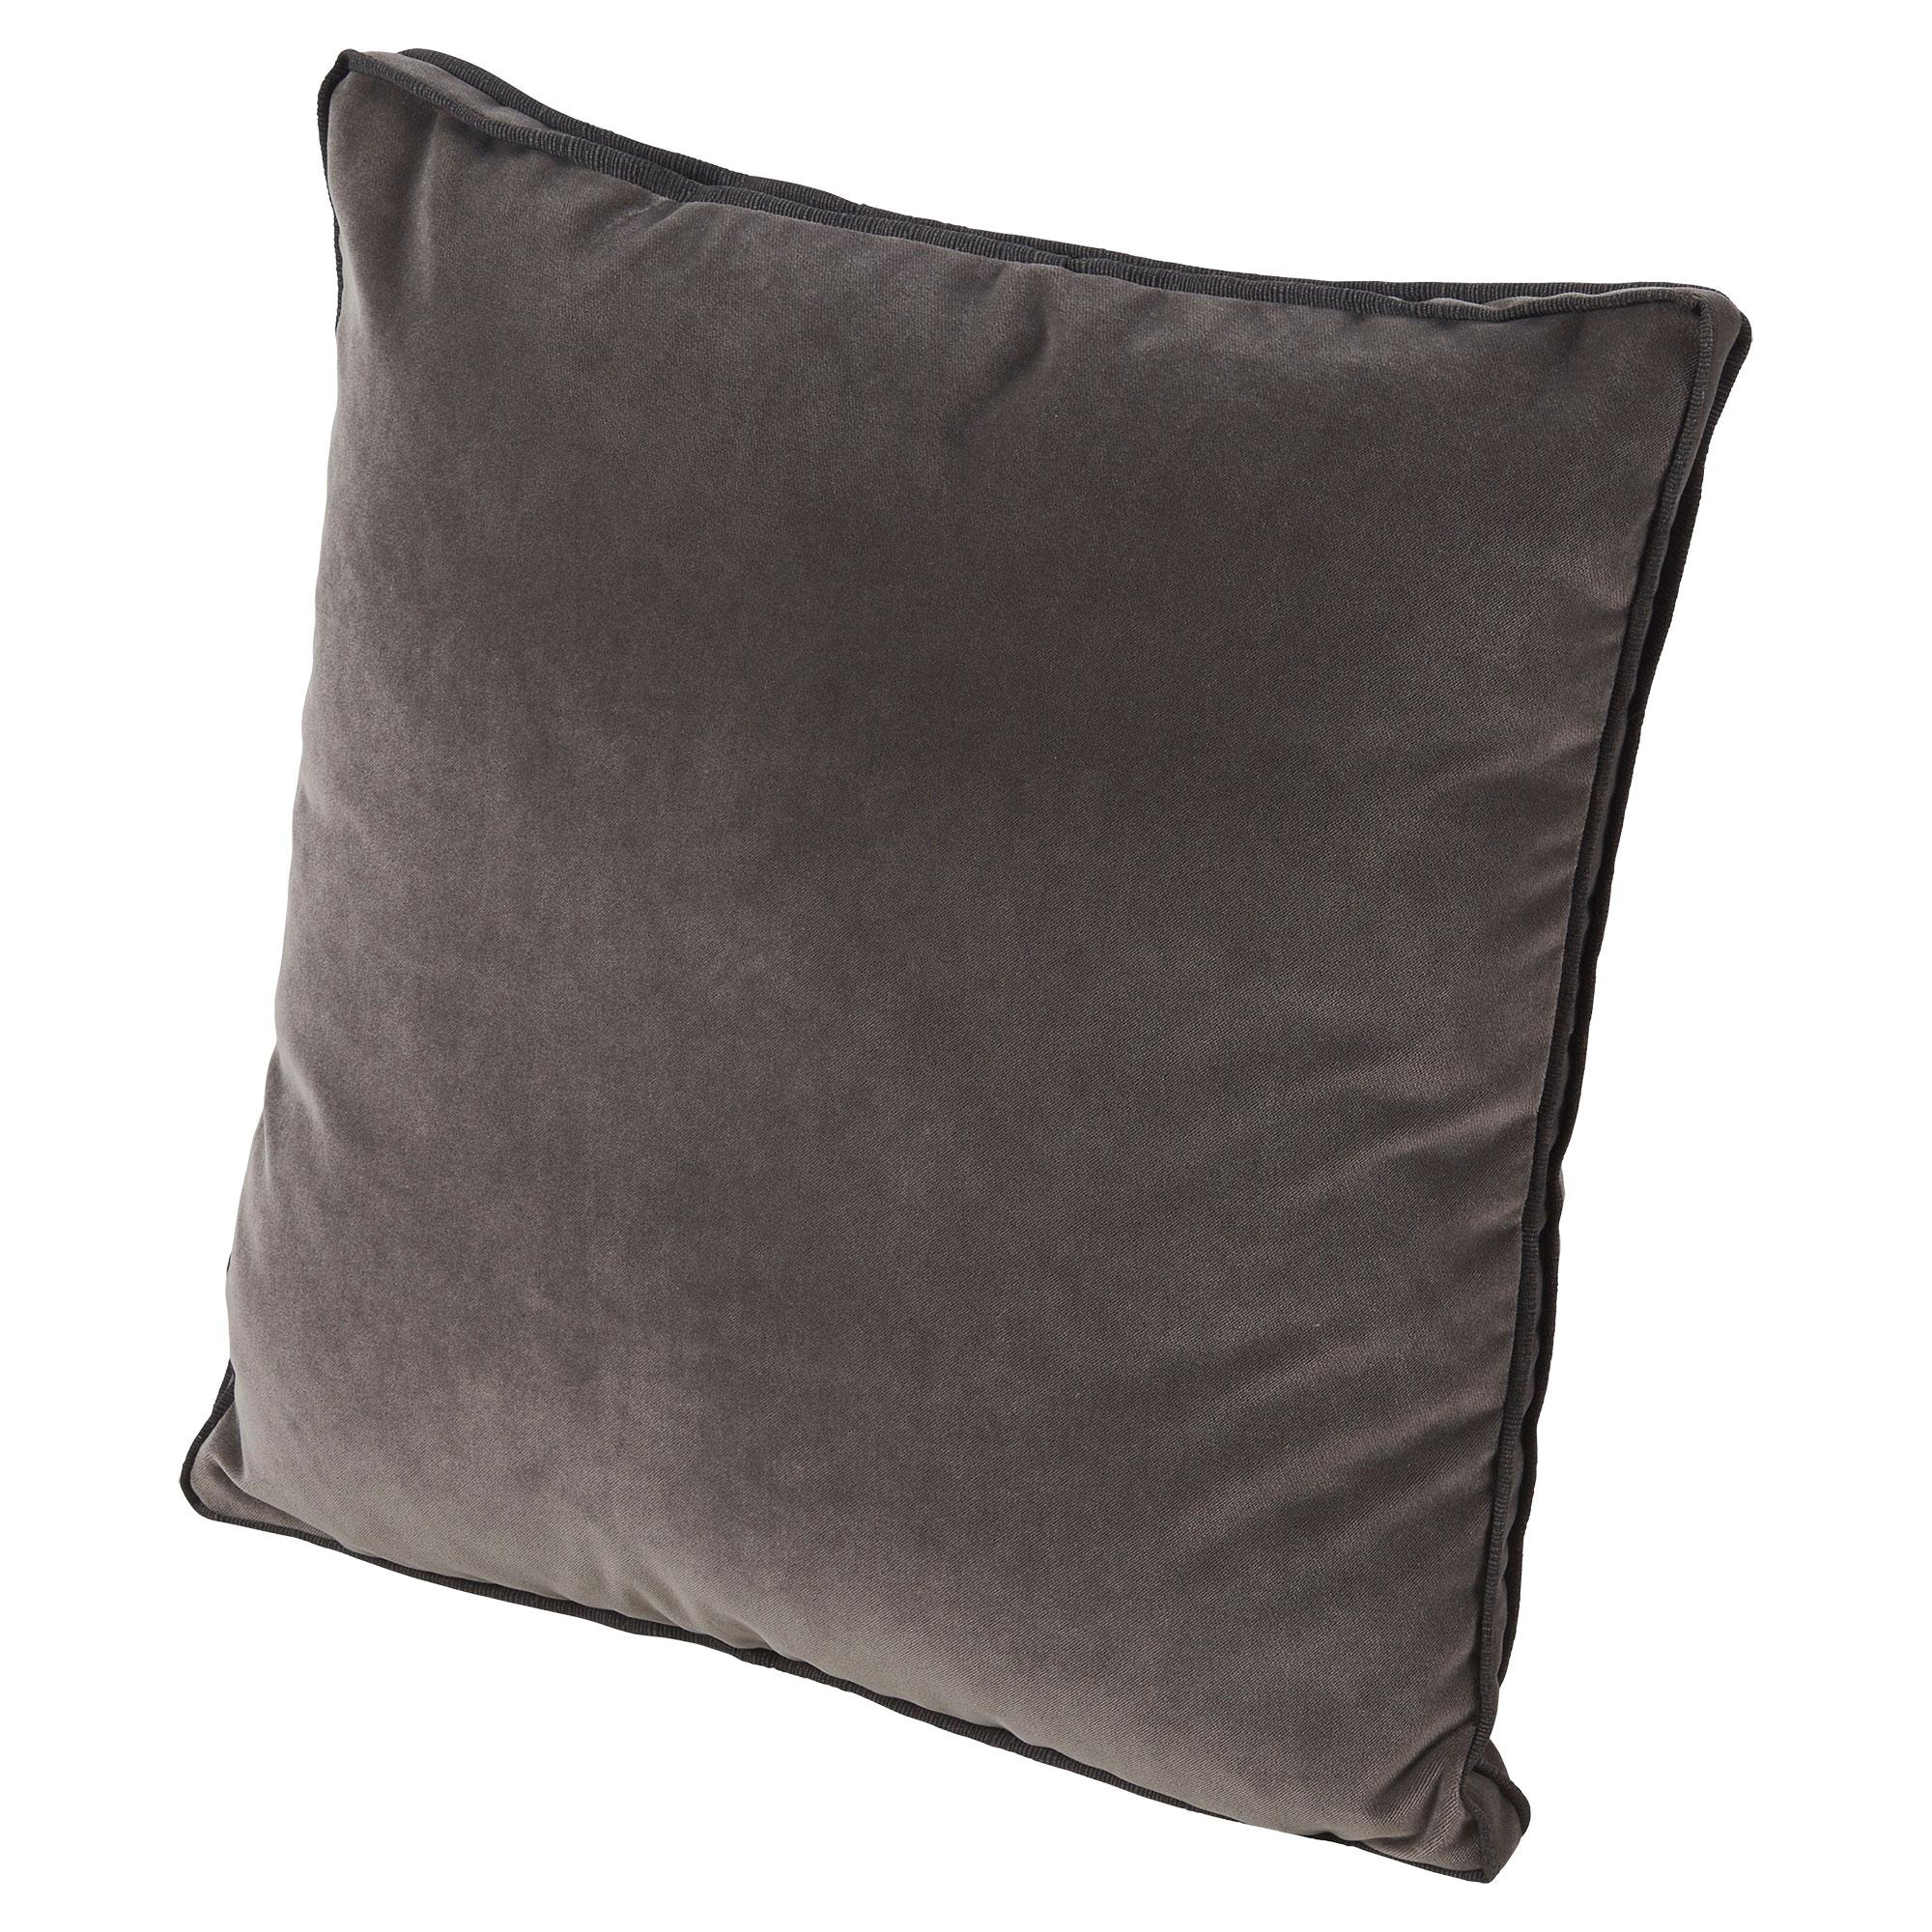 Tildy Classic Charcoal Grey Velvet Pillow - 22x22